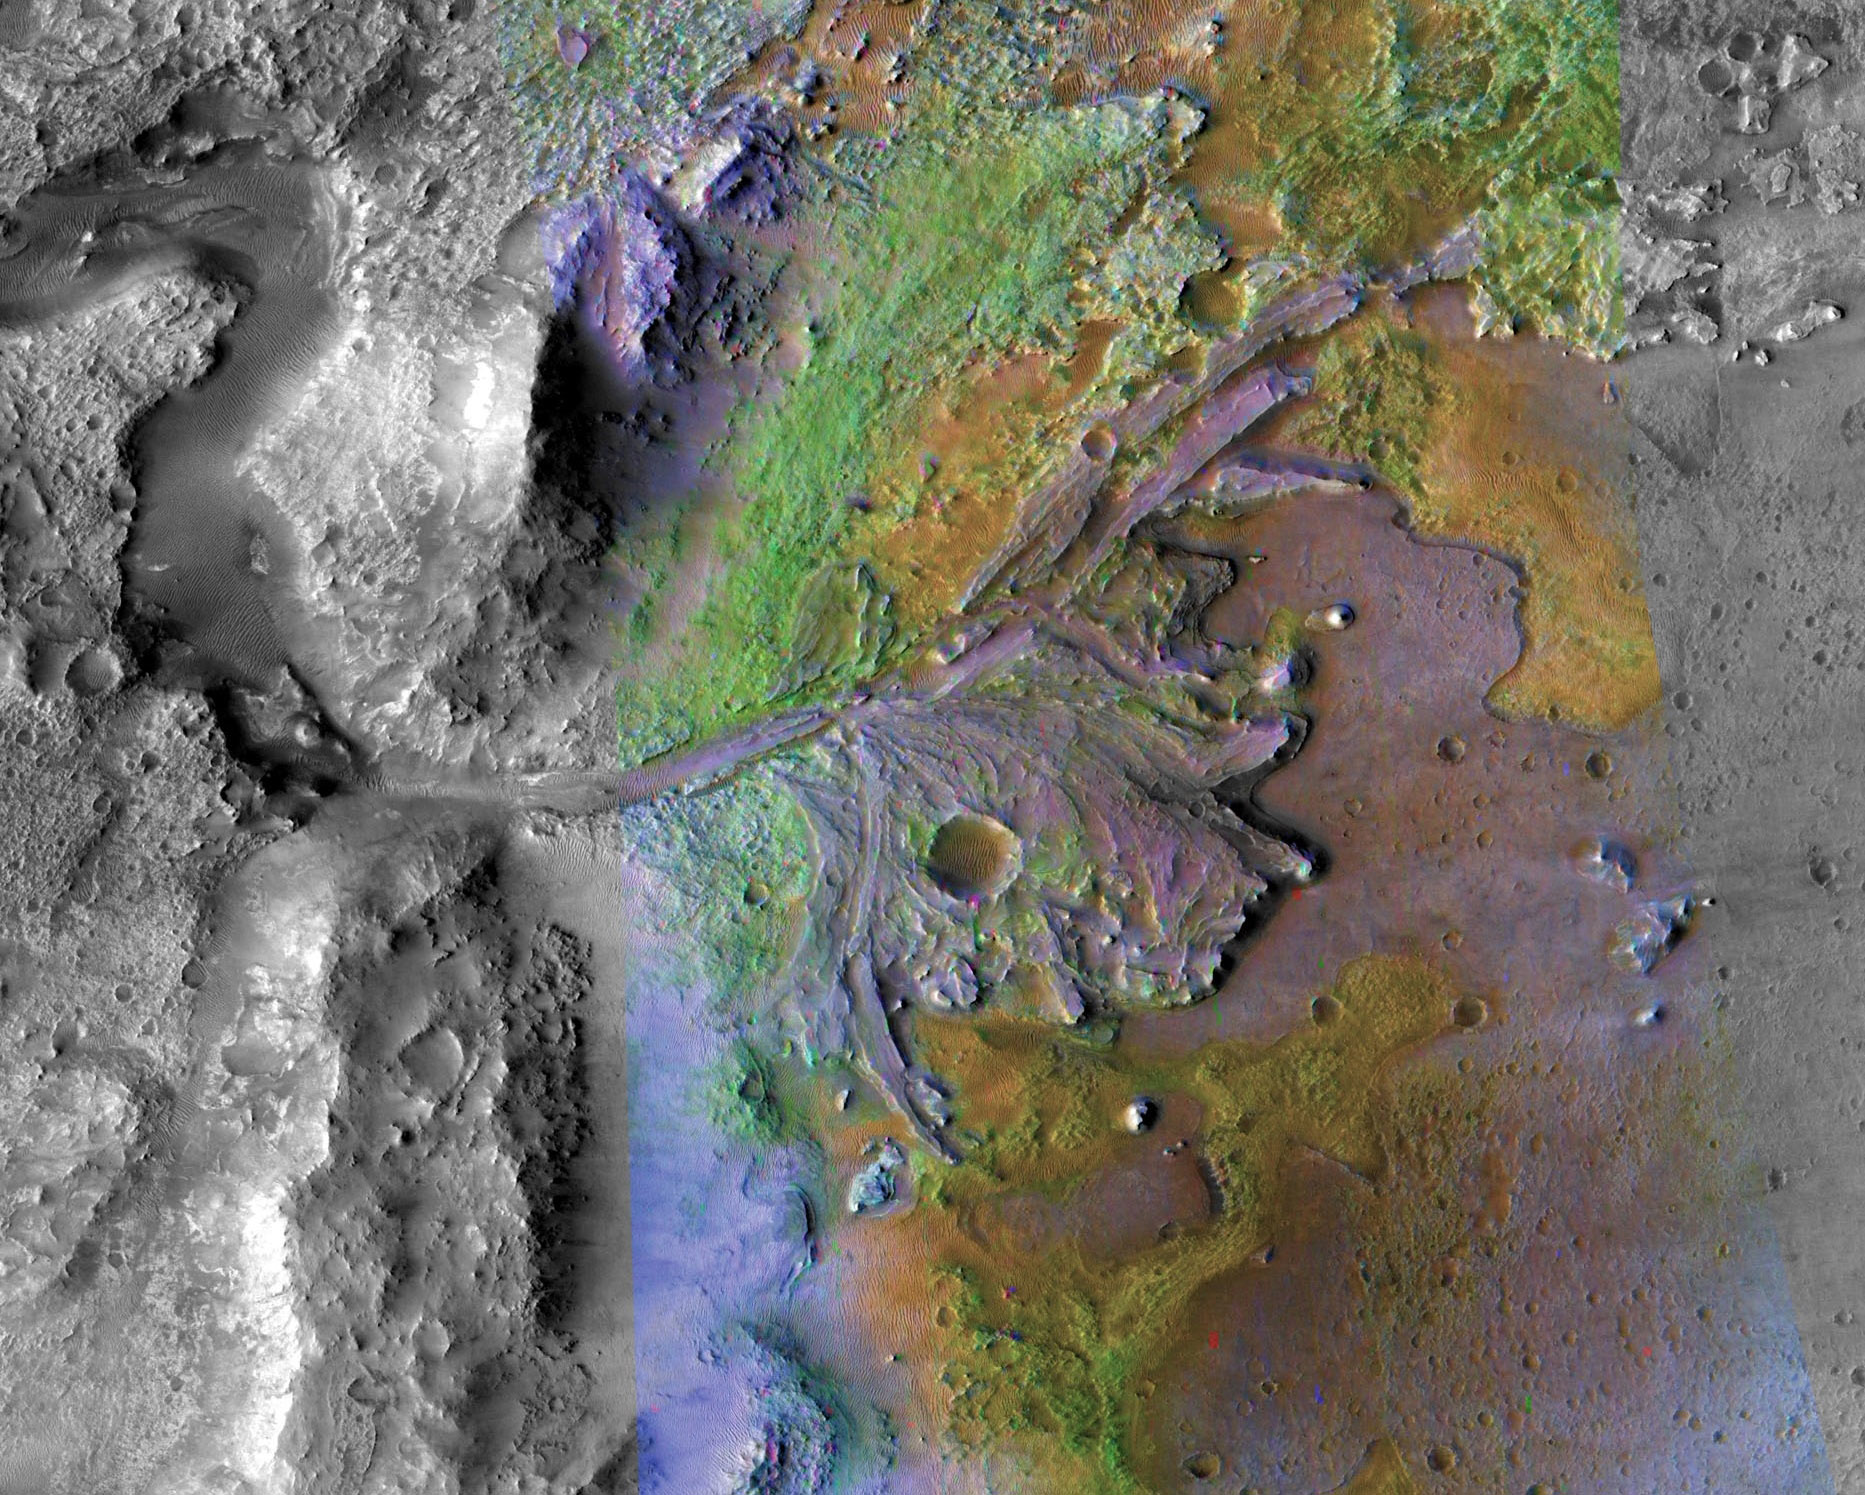 Meet Jezero Crater, the future landing site of the Mars 2020 rover.